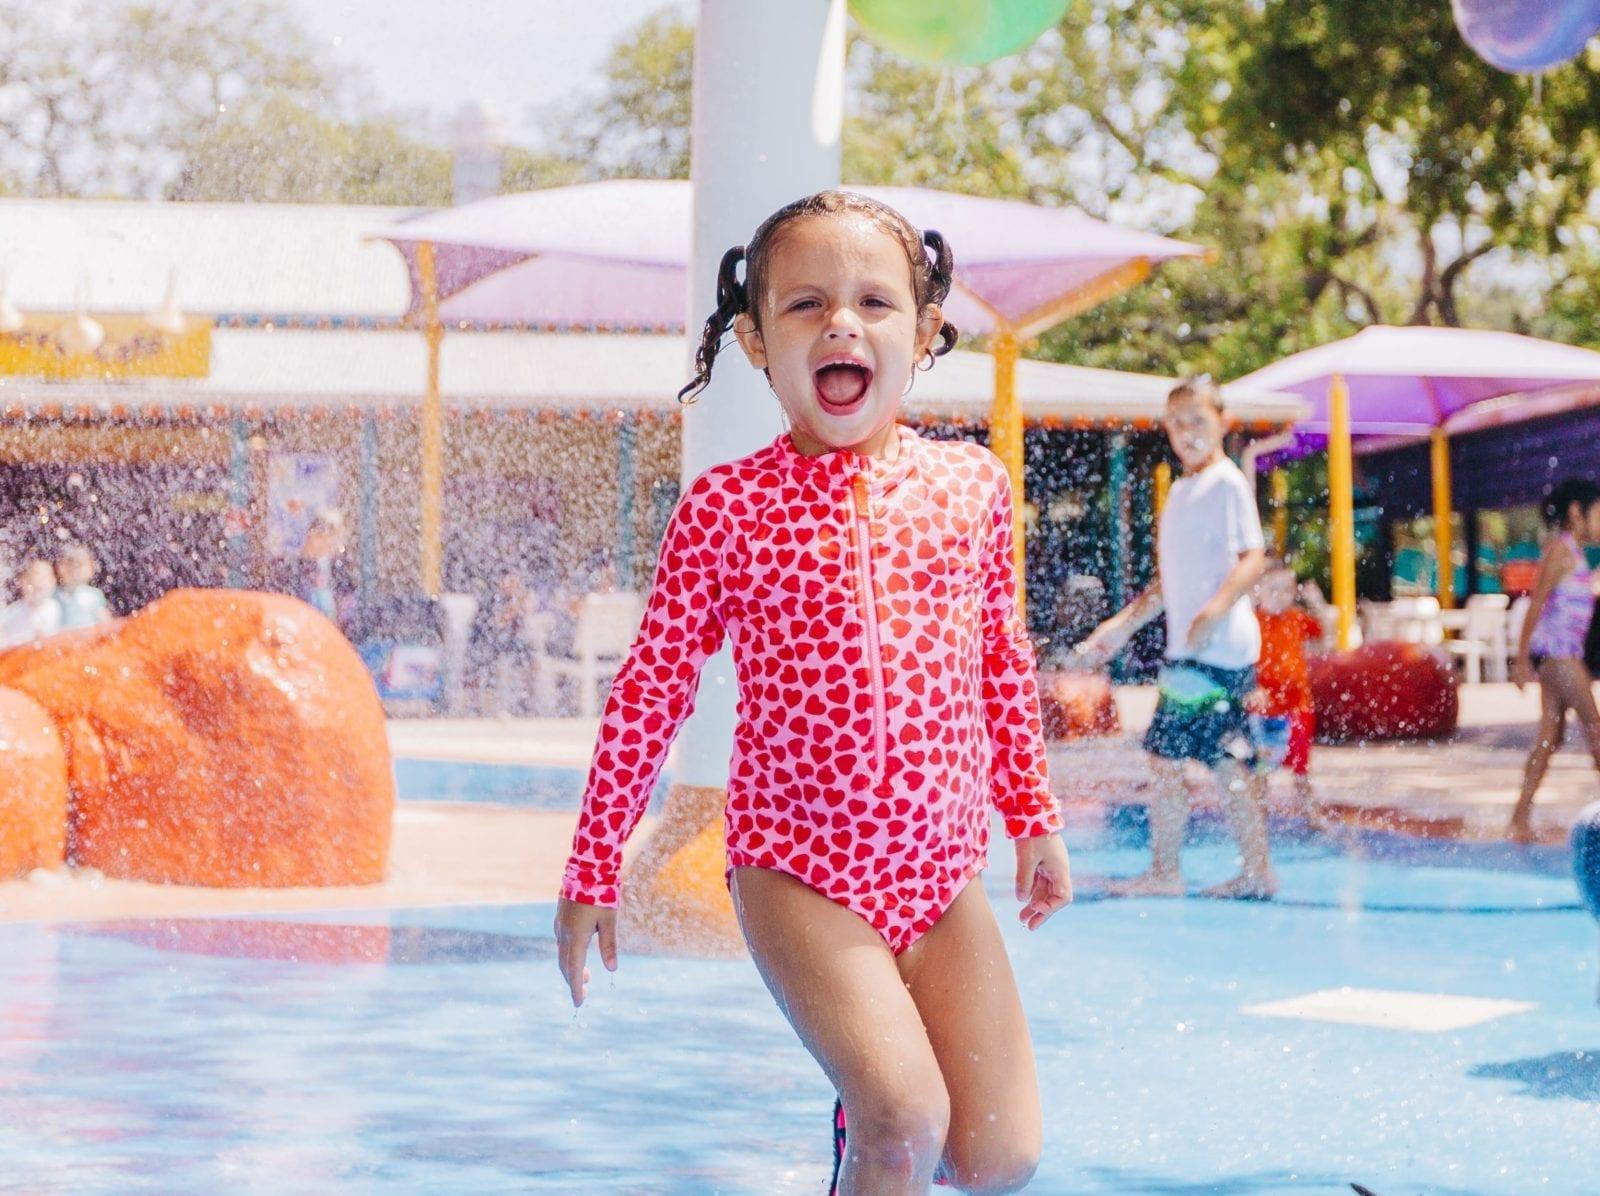 A photo of a girl and other children splashing around enjoying the Wallaroo Splash Pad at ZooTampa